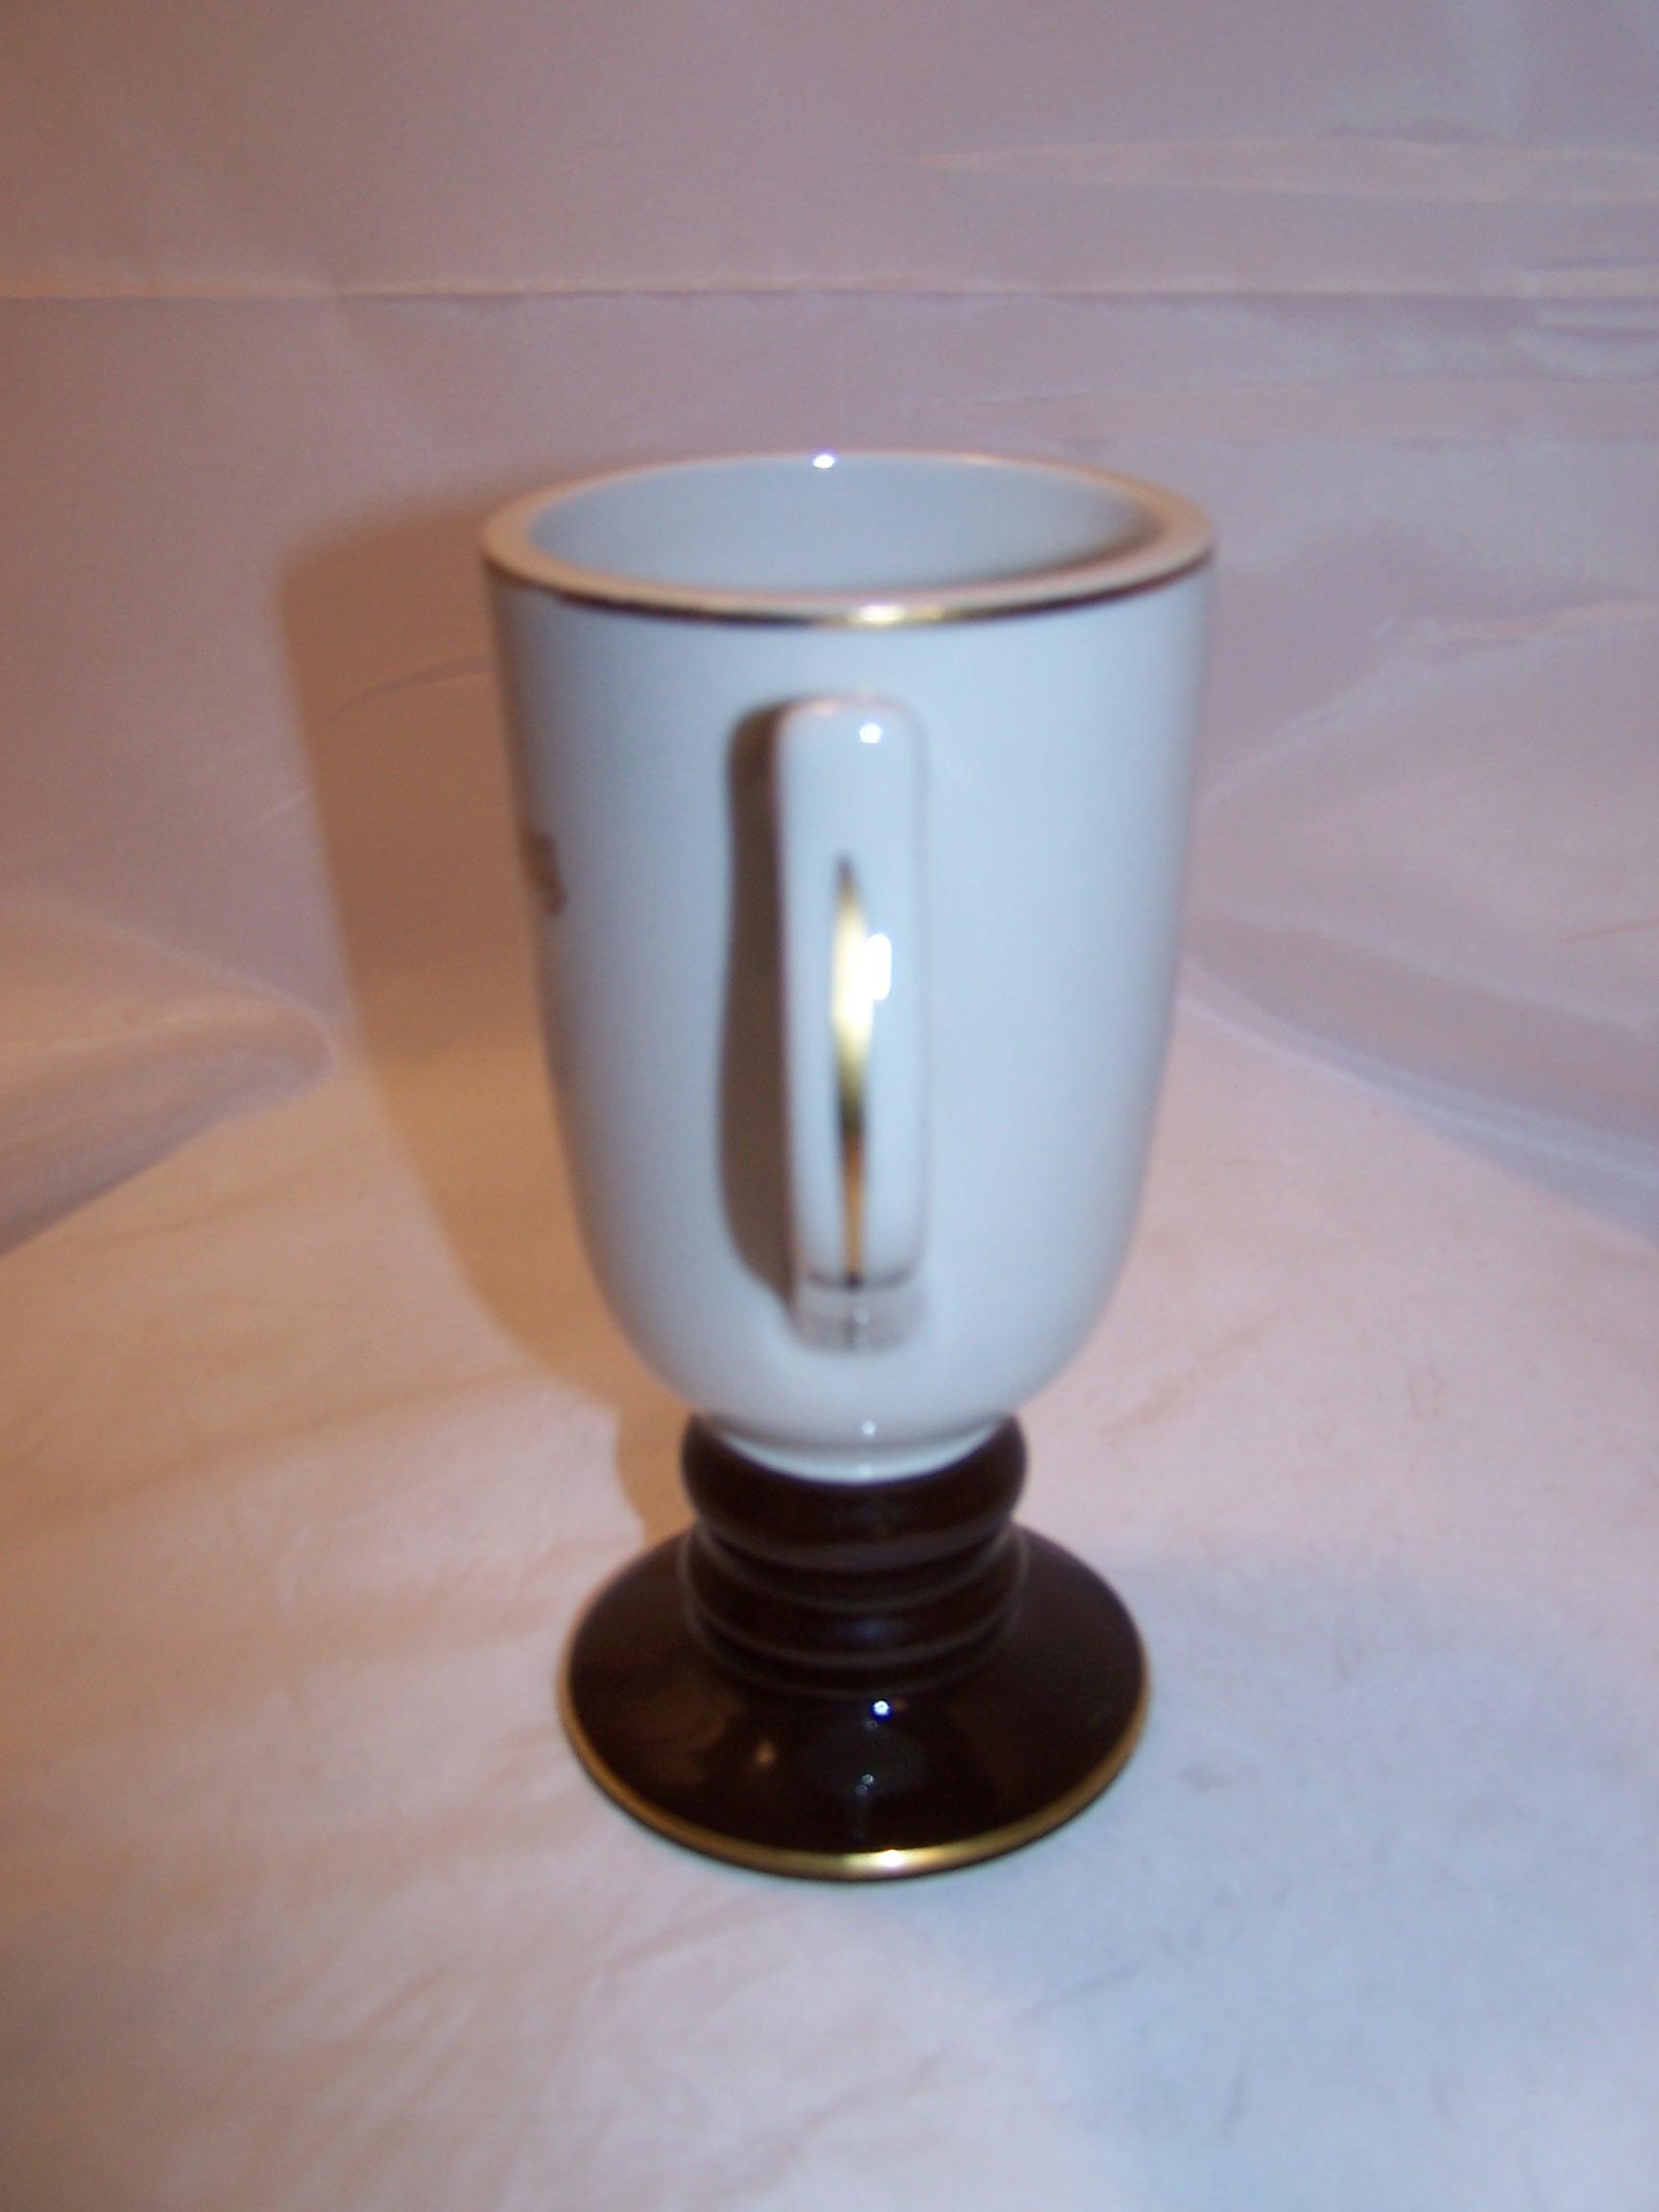 Image 1 of Bob Feller Mug, The Pewter Mug Restaurant, Vintage